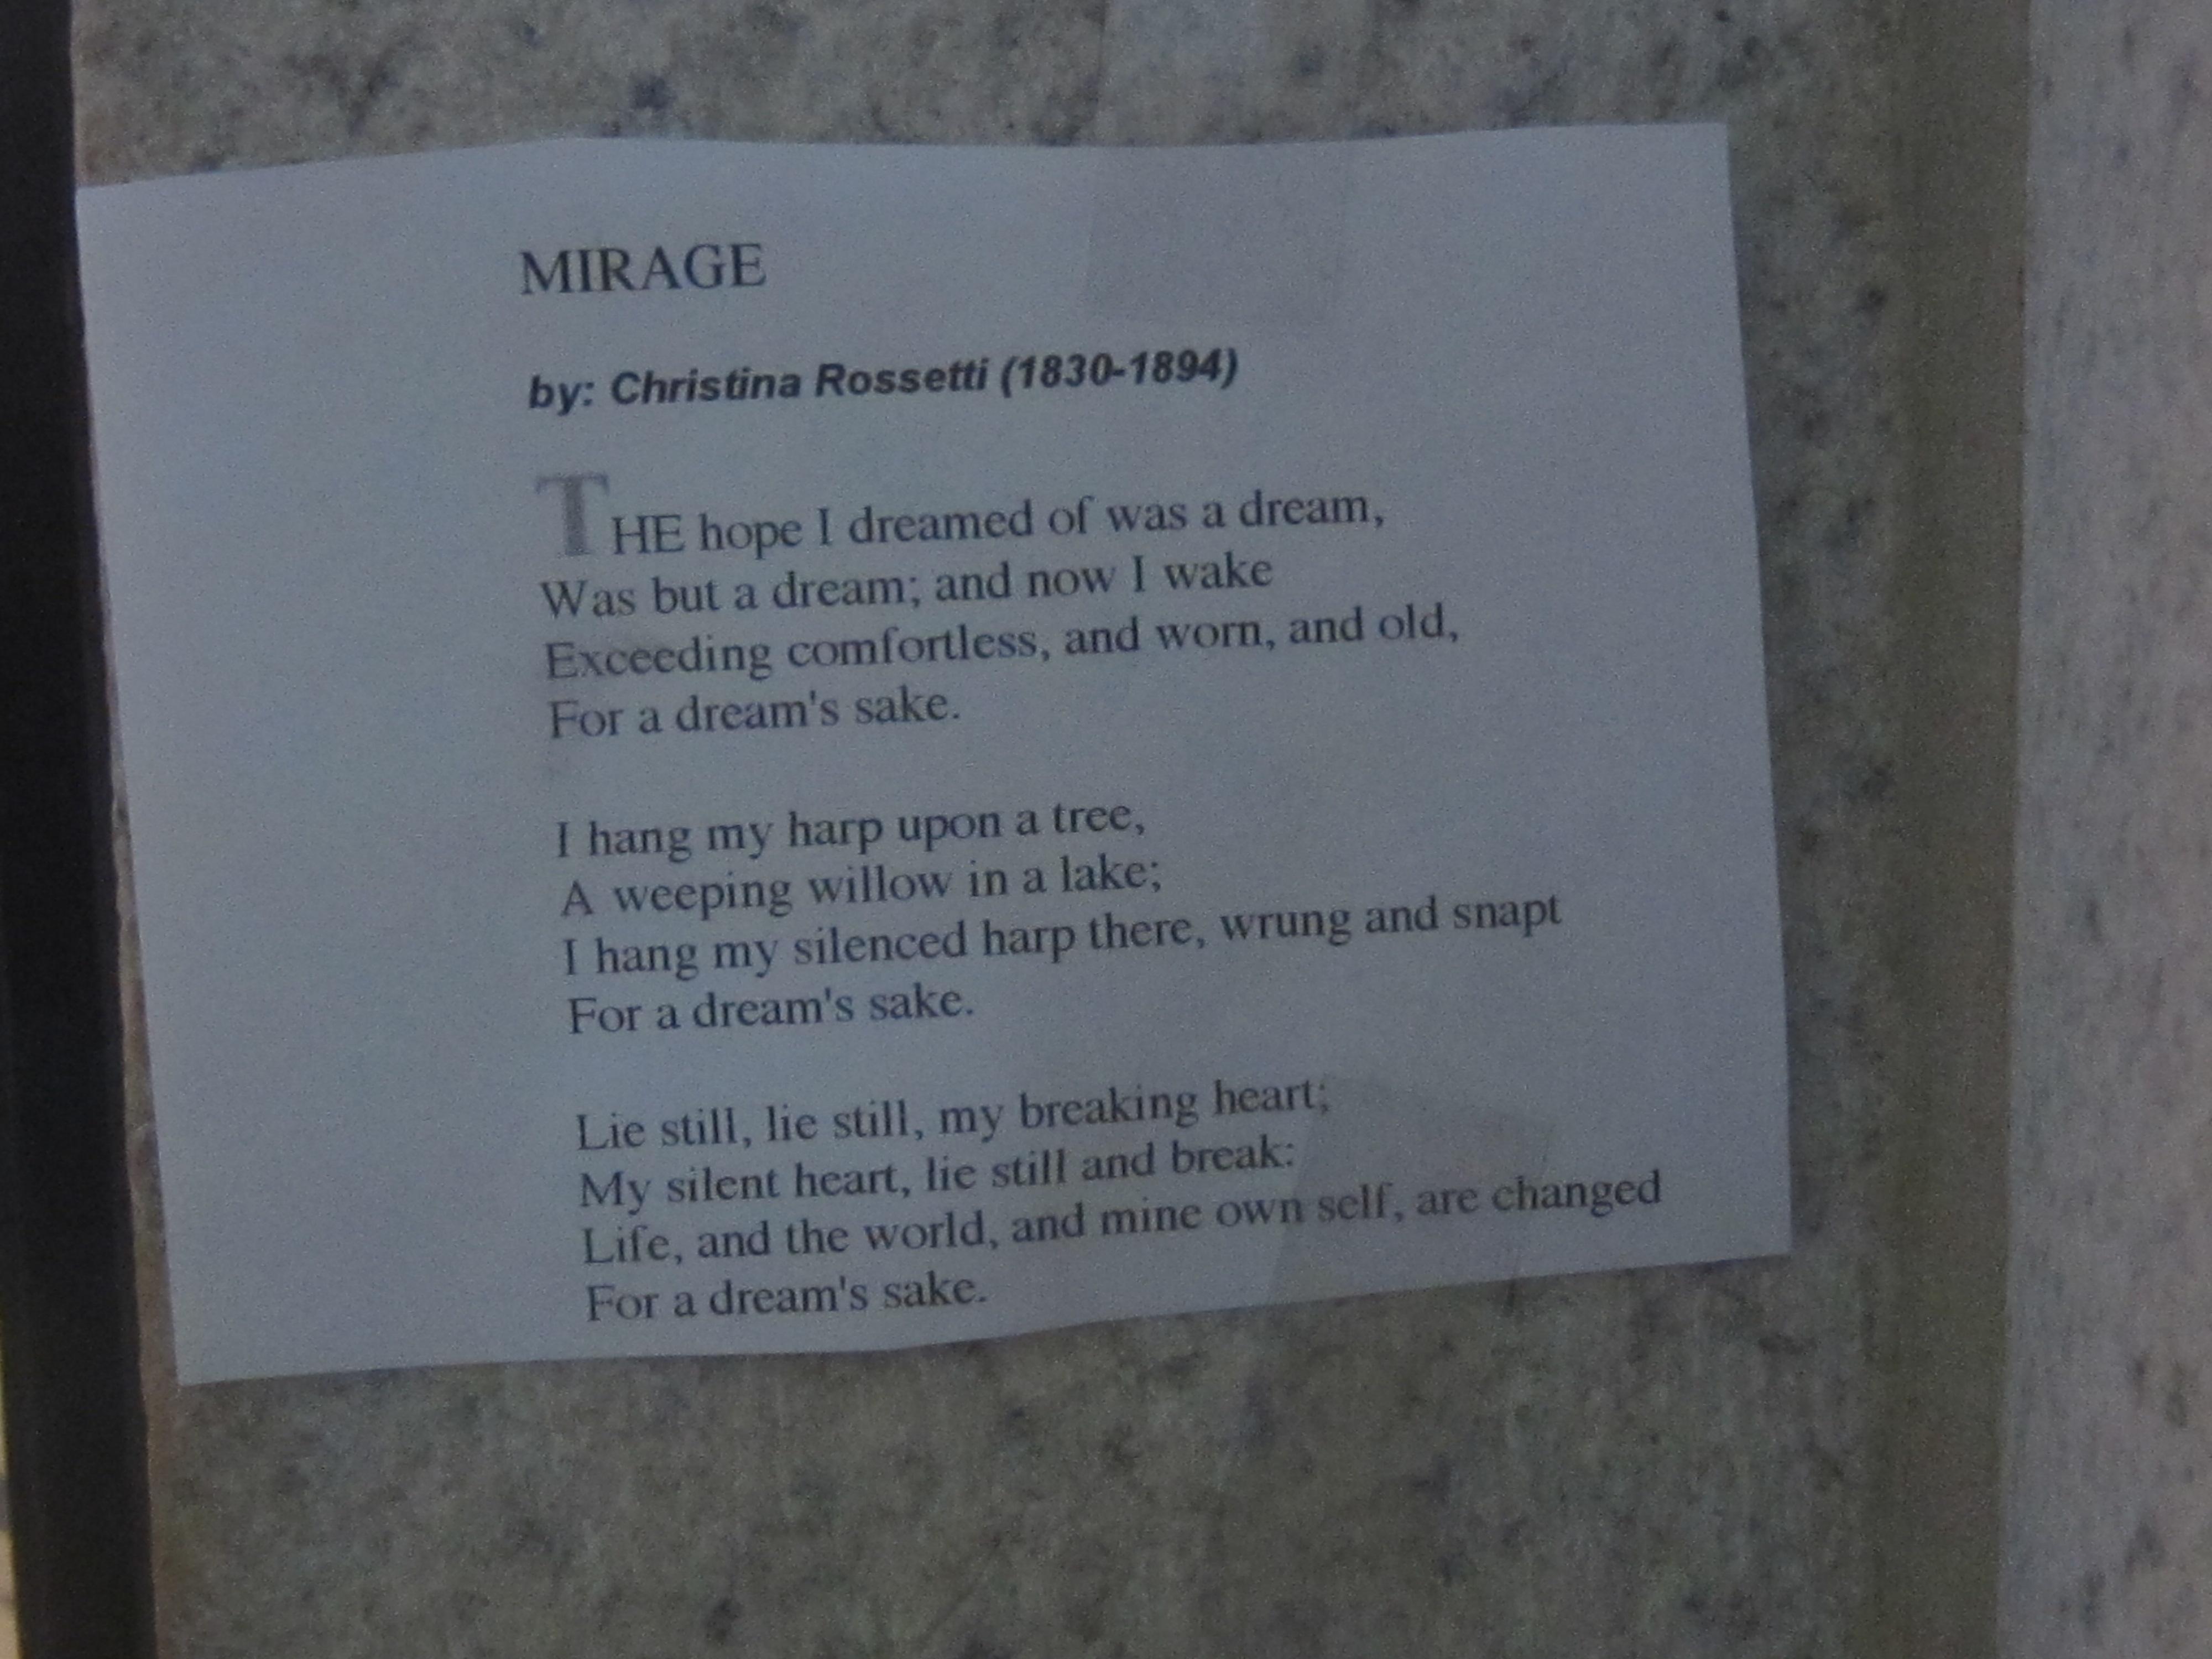 birthday by christina rossetti essay